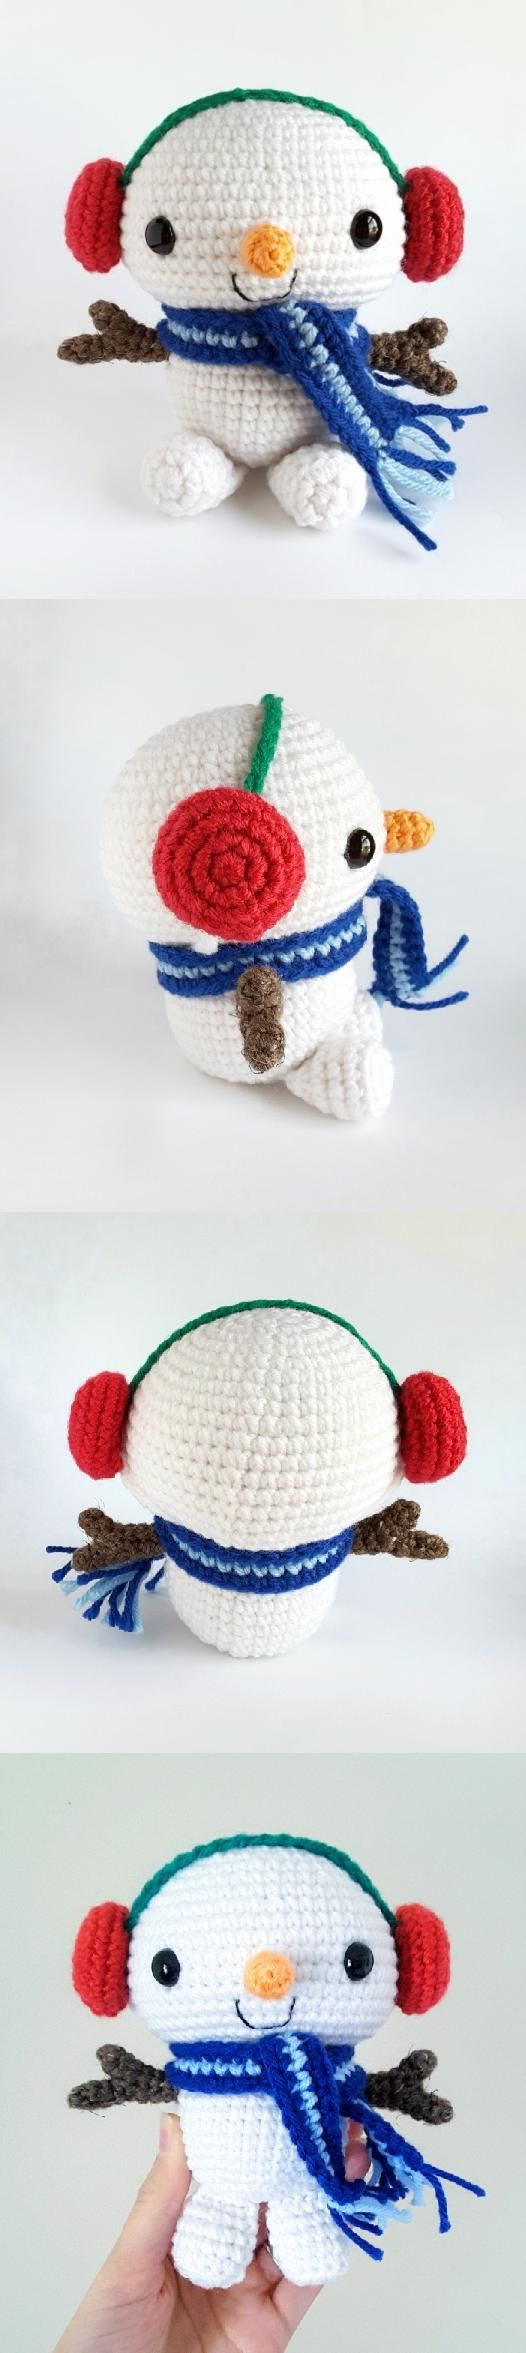 Snuggly Snowman amigurumi pattern